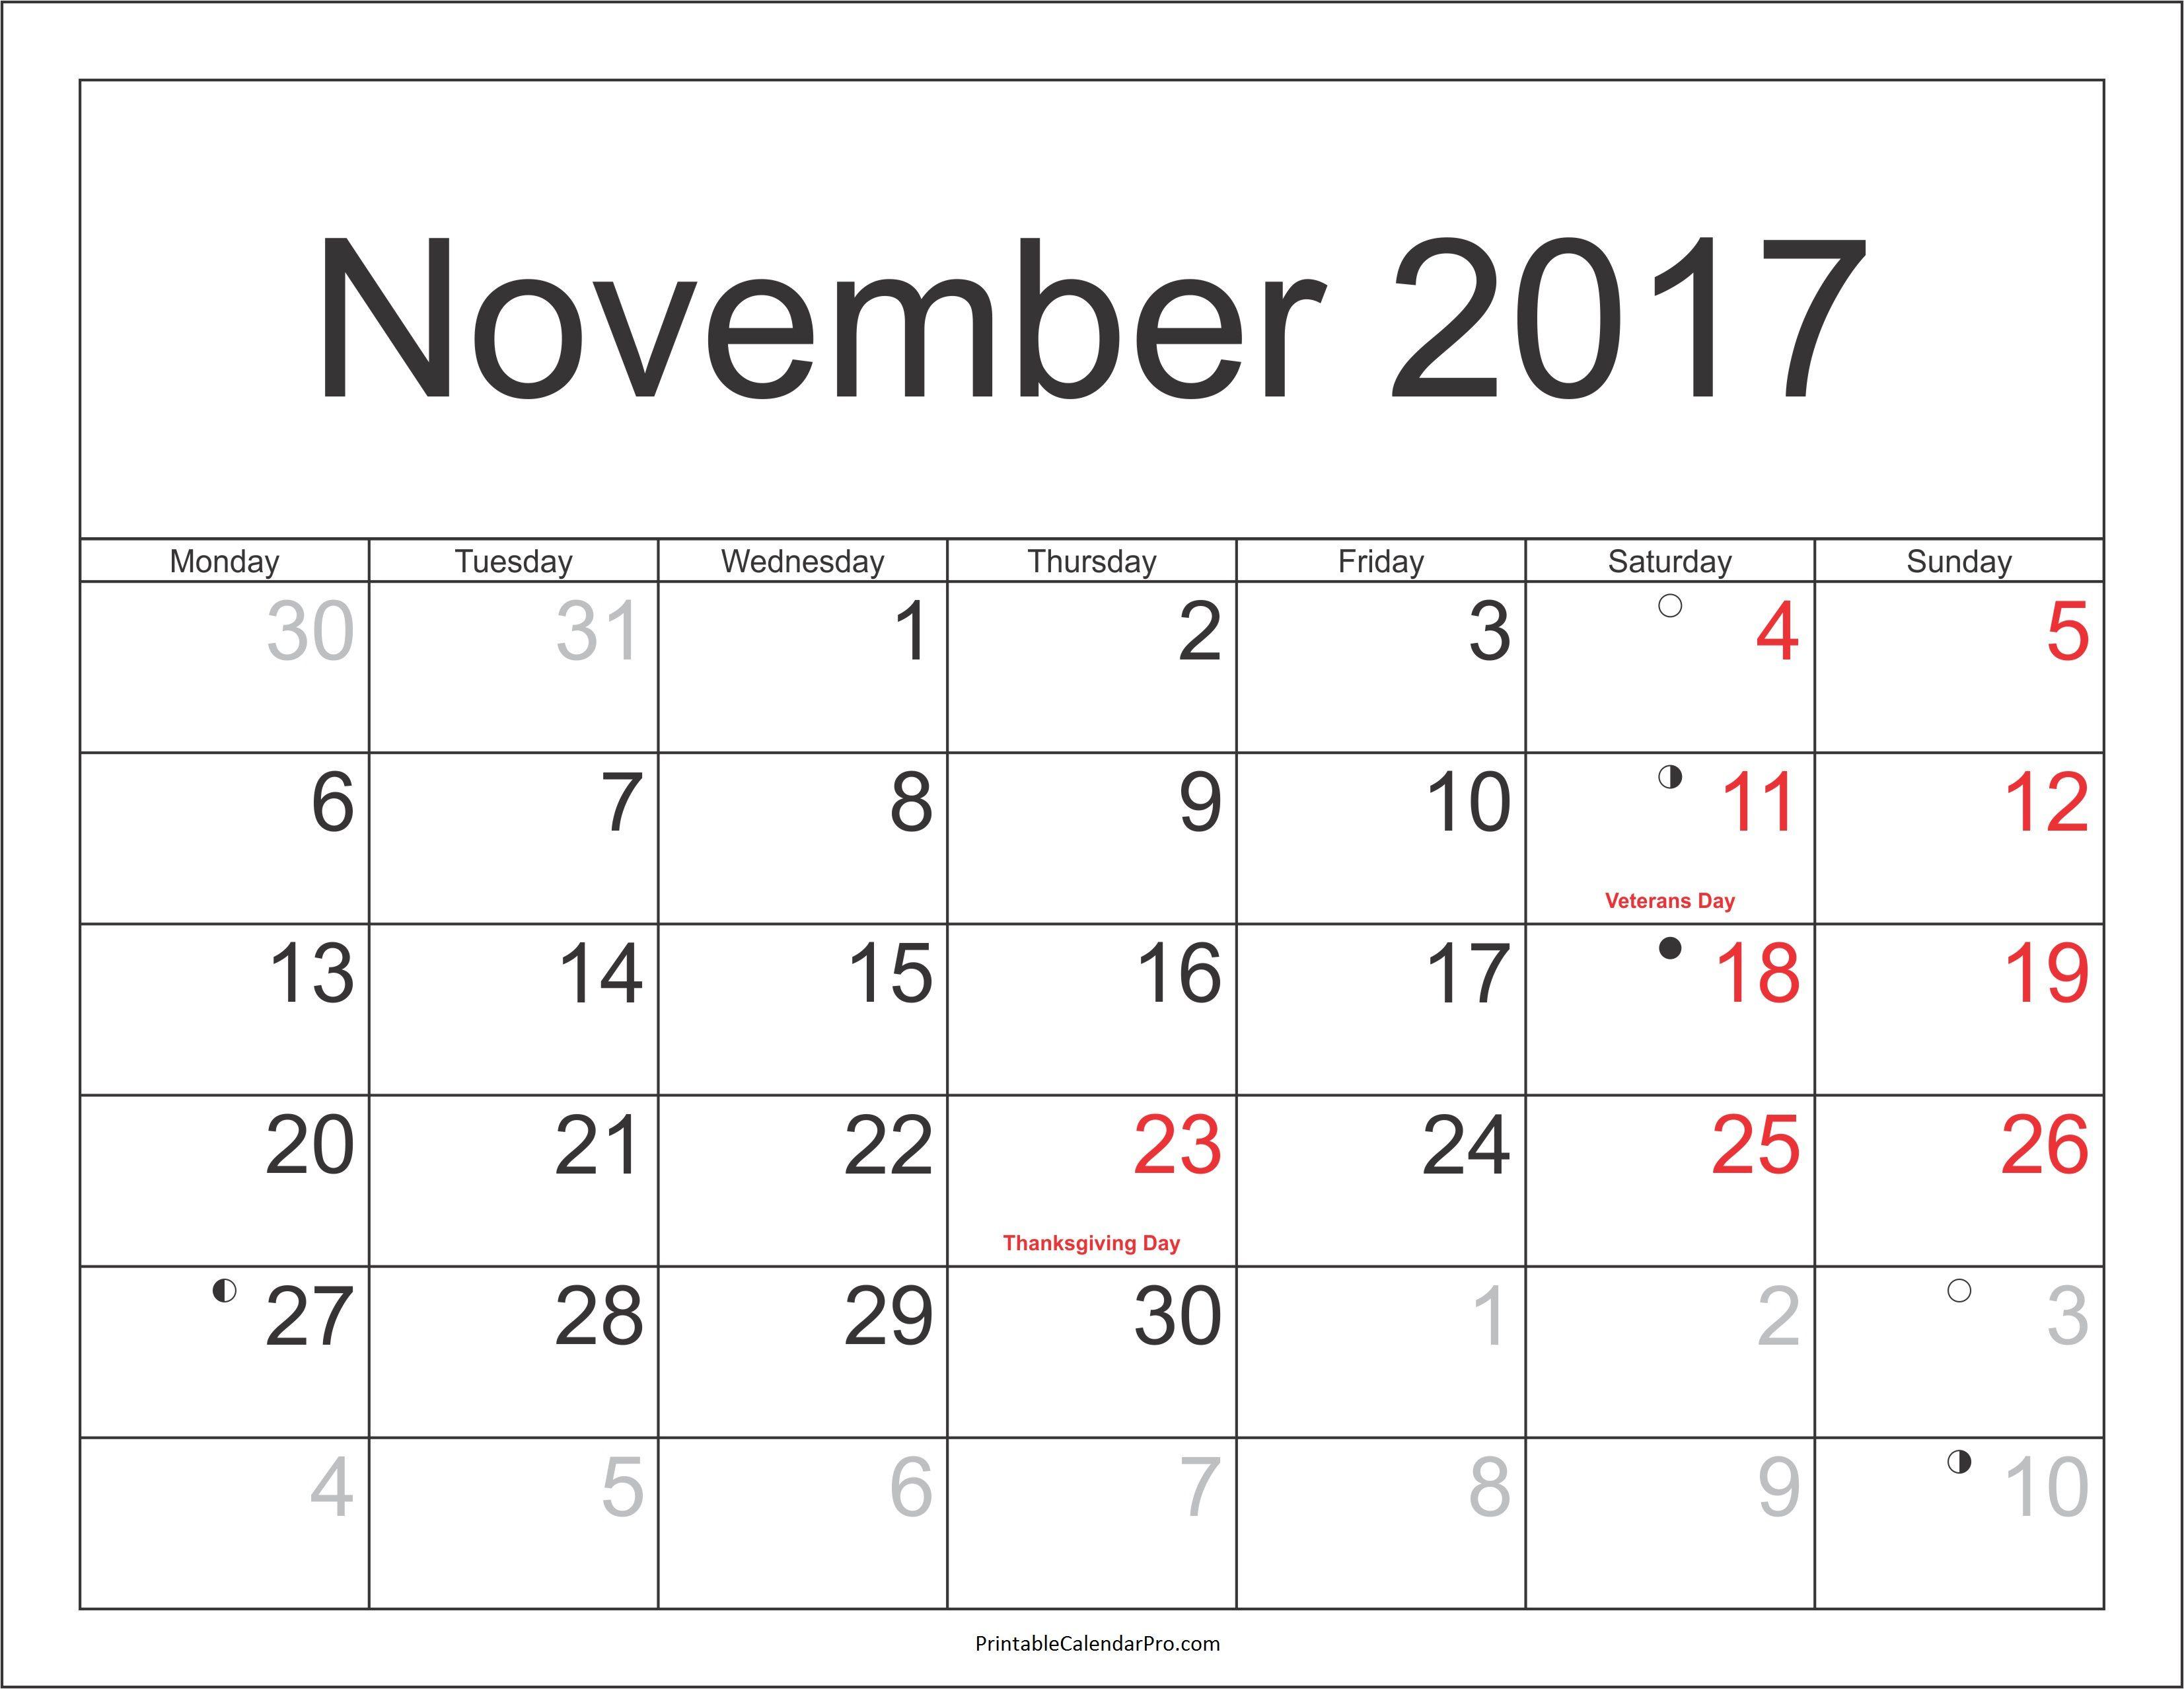 free december 2017 calendar printable templates with holidays printable calendar 2017